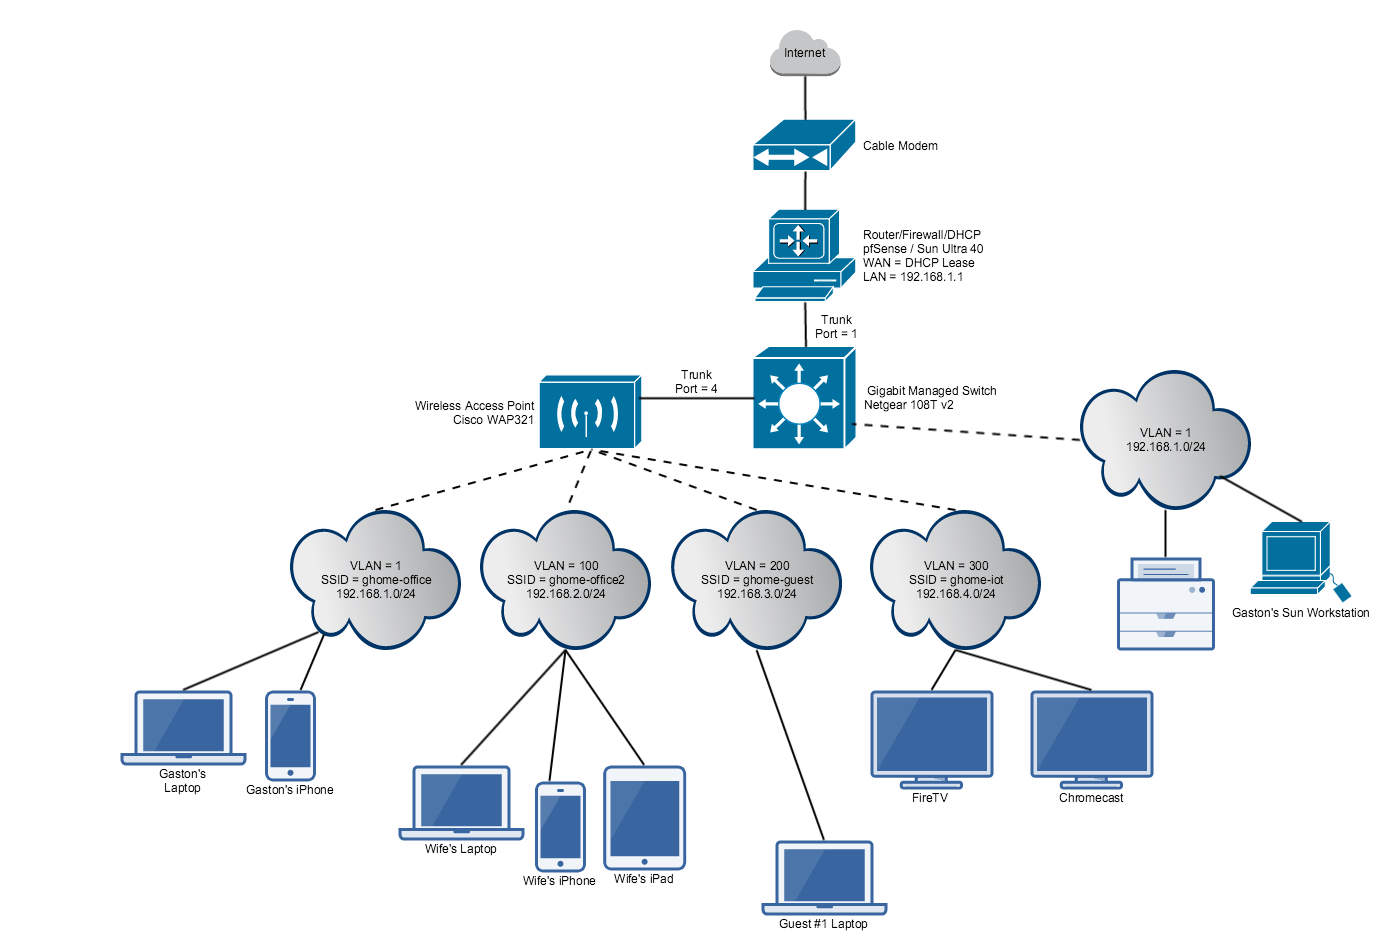 pfsense netgear 108t smart switch cisco wap321 small business networking for the home [ 1392 x 951 Pixel ]